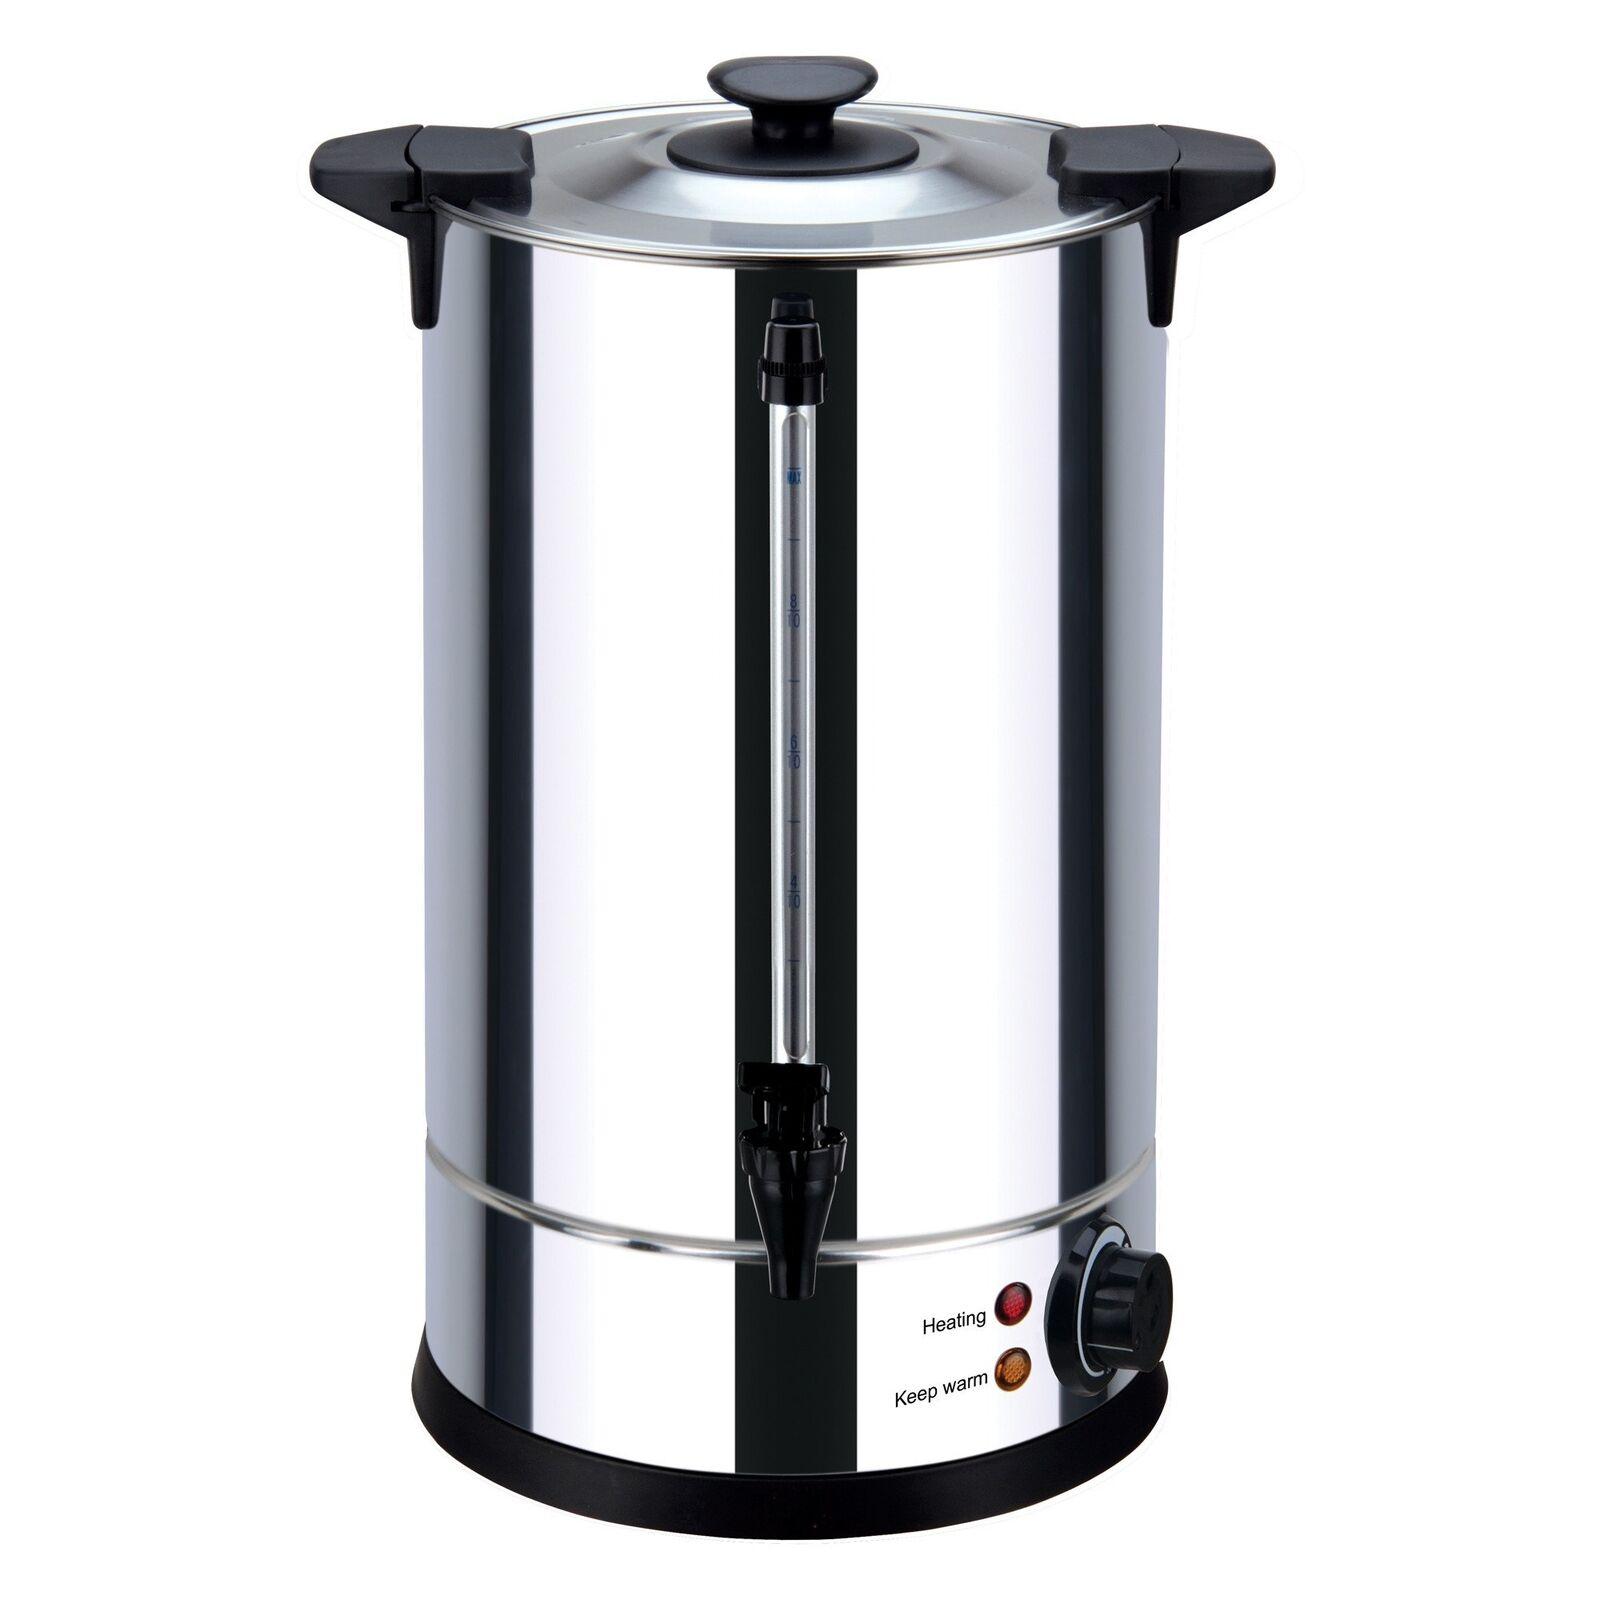 Igenix IG4018 Catering Urn & Hot Water Boiler, 18 Litre